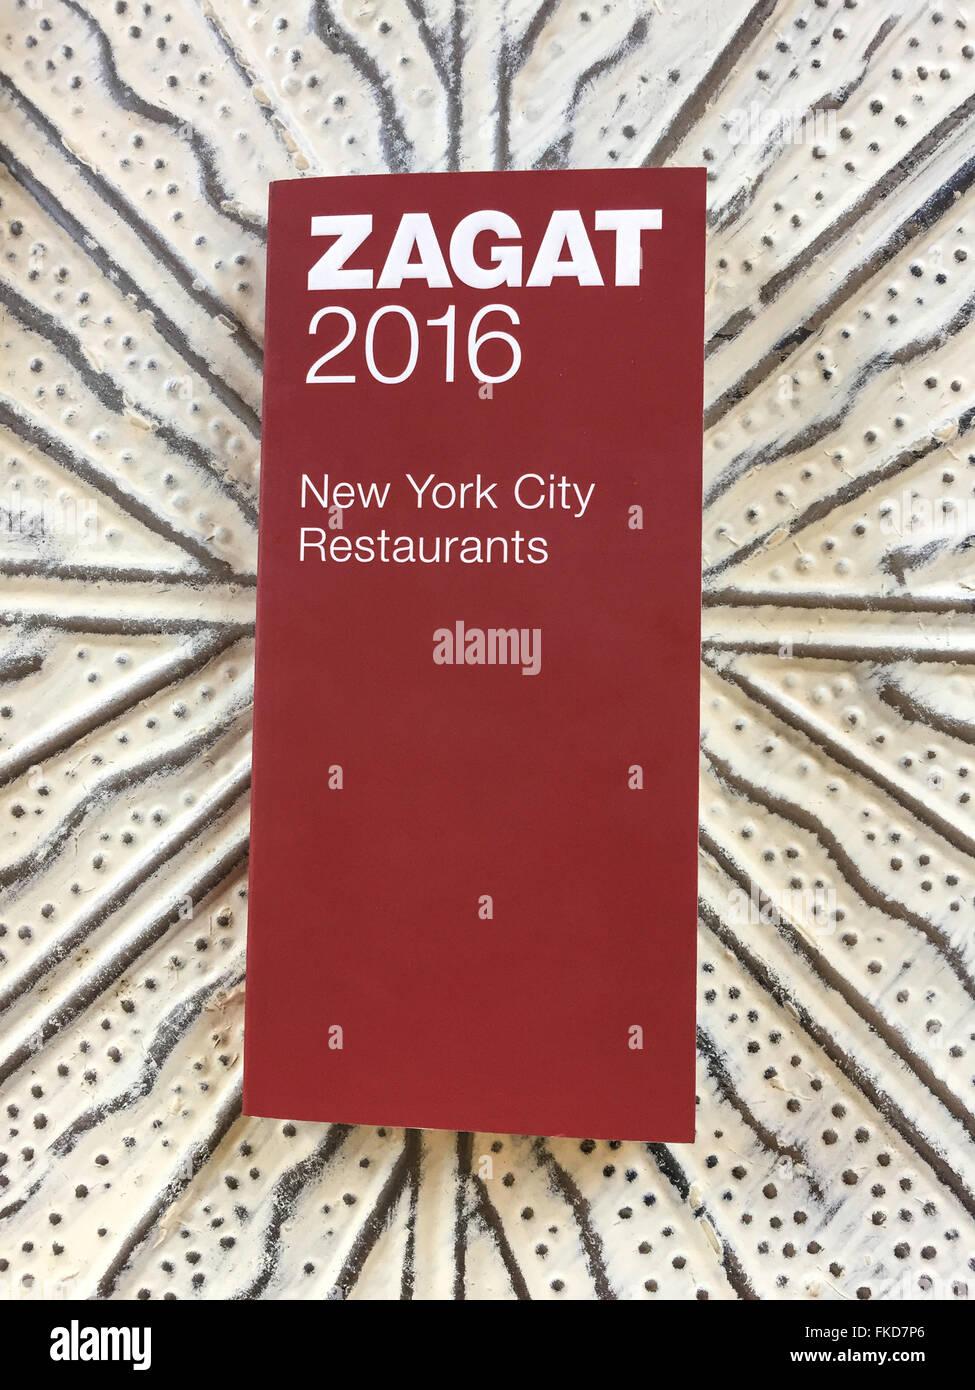 2012 new york city restaurants (zagat restaurant guides): zagat.